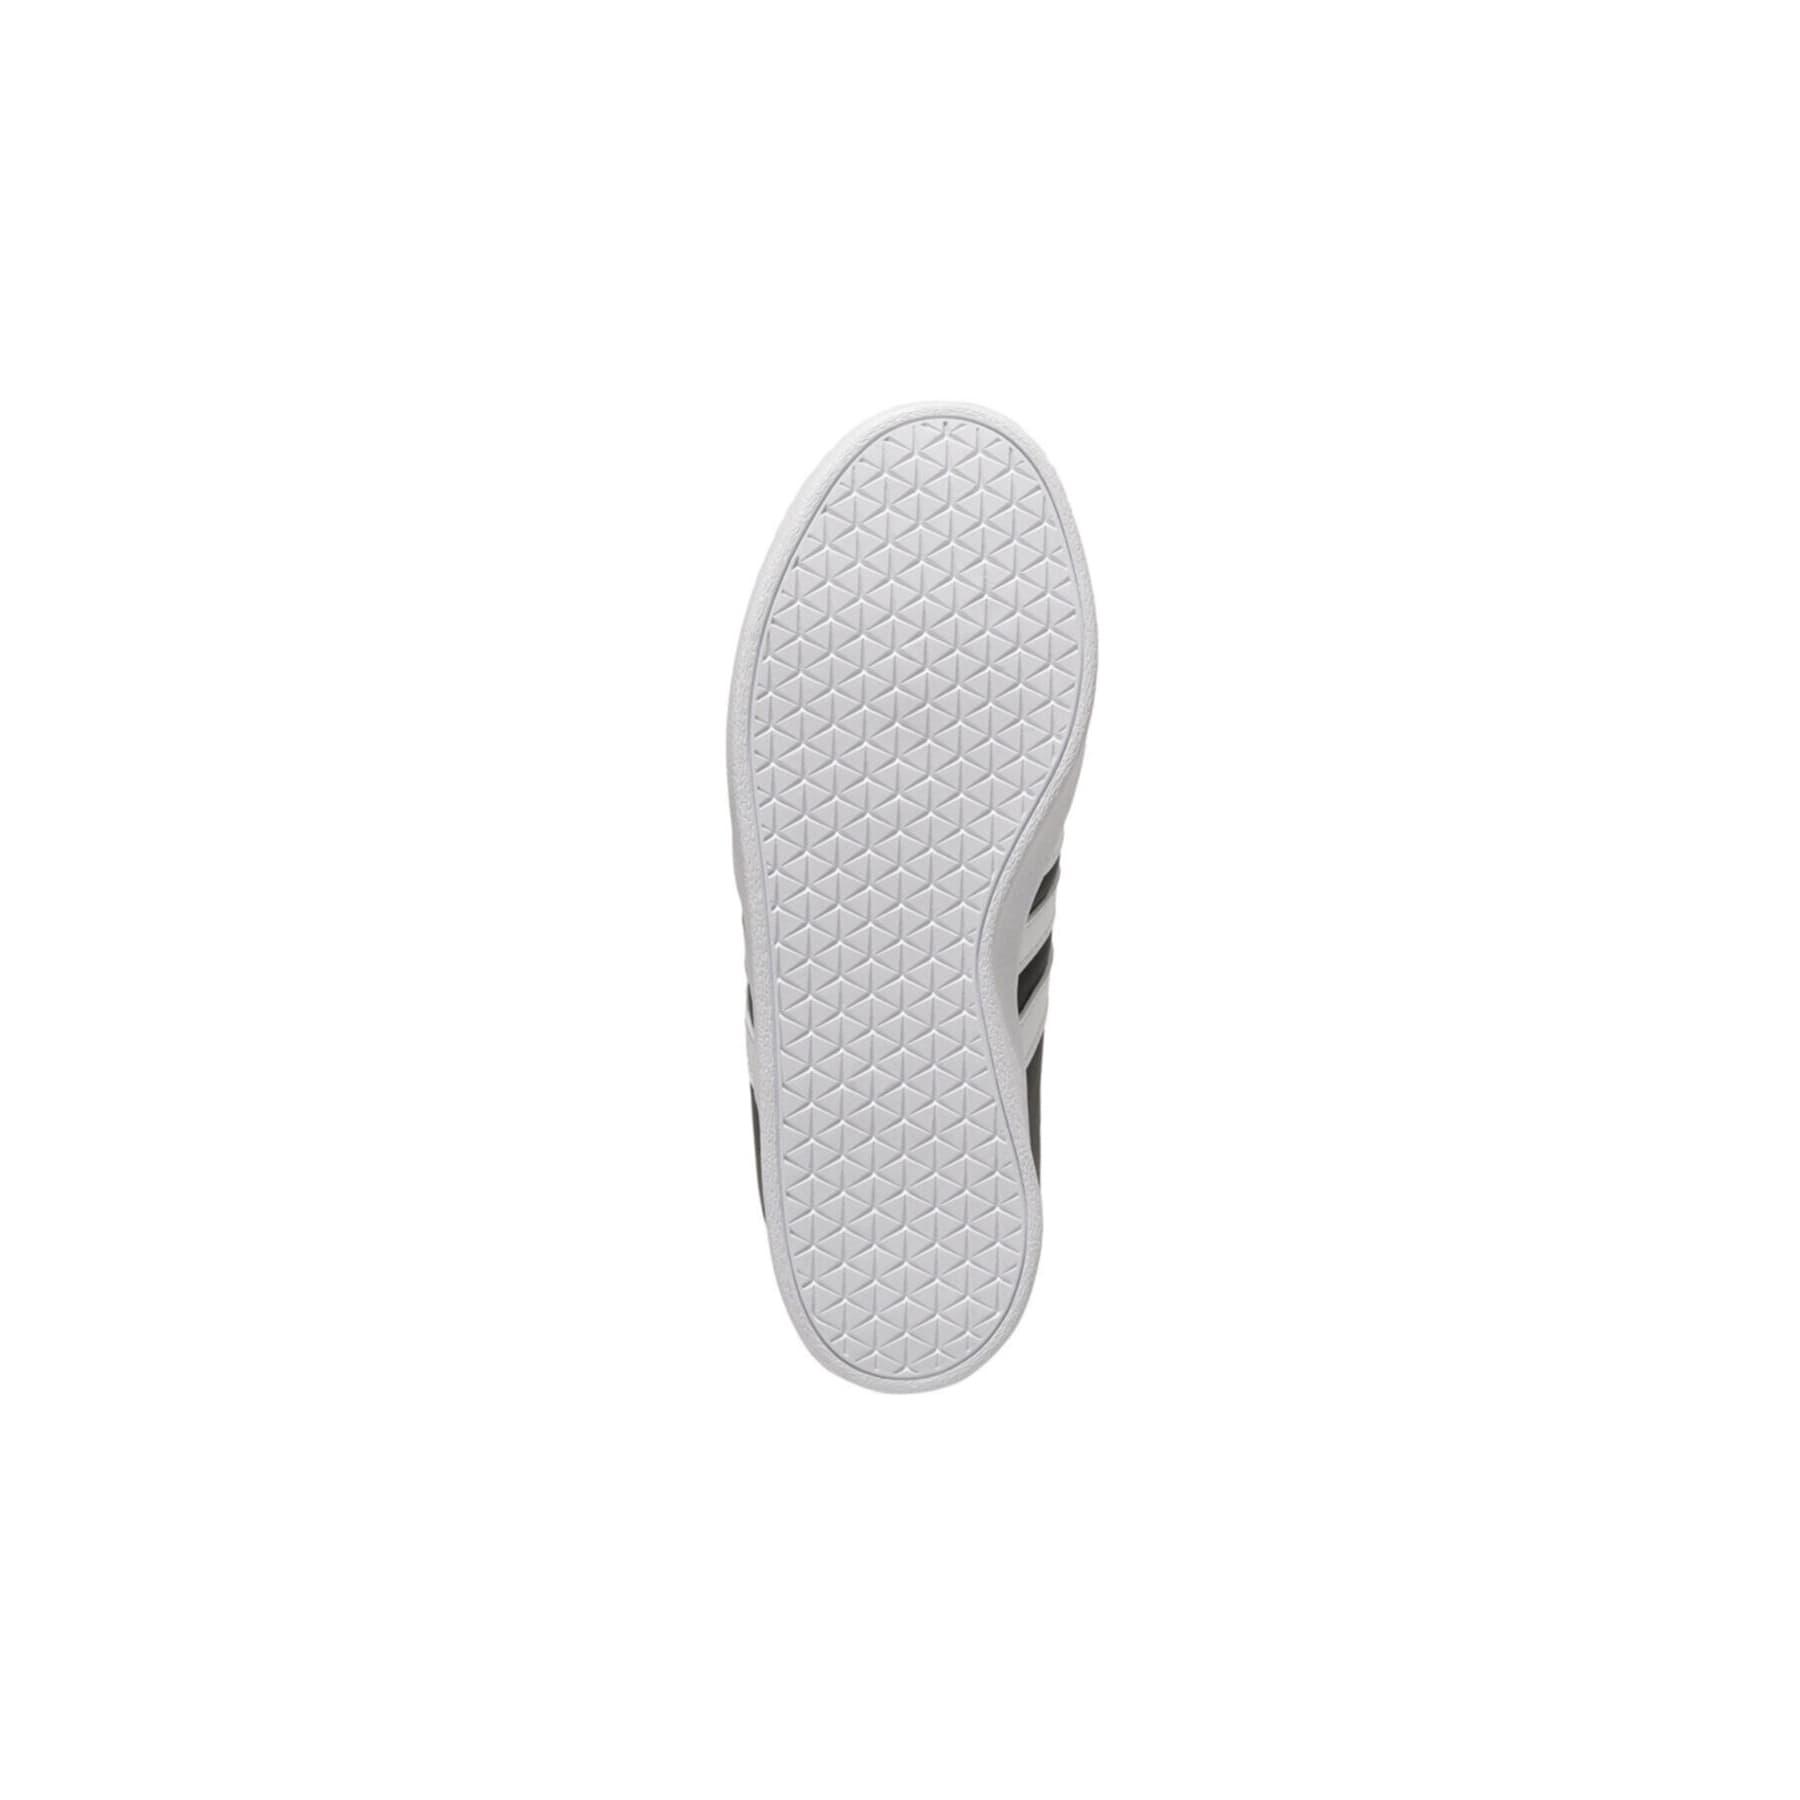 Easy Vulc 2.0 Erkek Siyah Spor Ayakkabı (B43665)